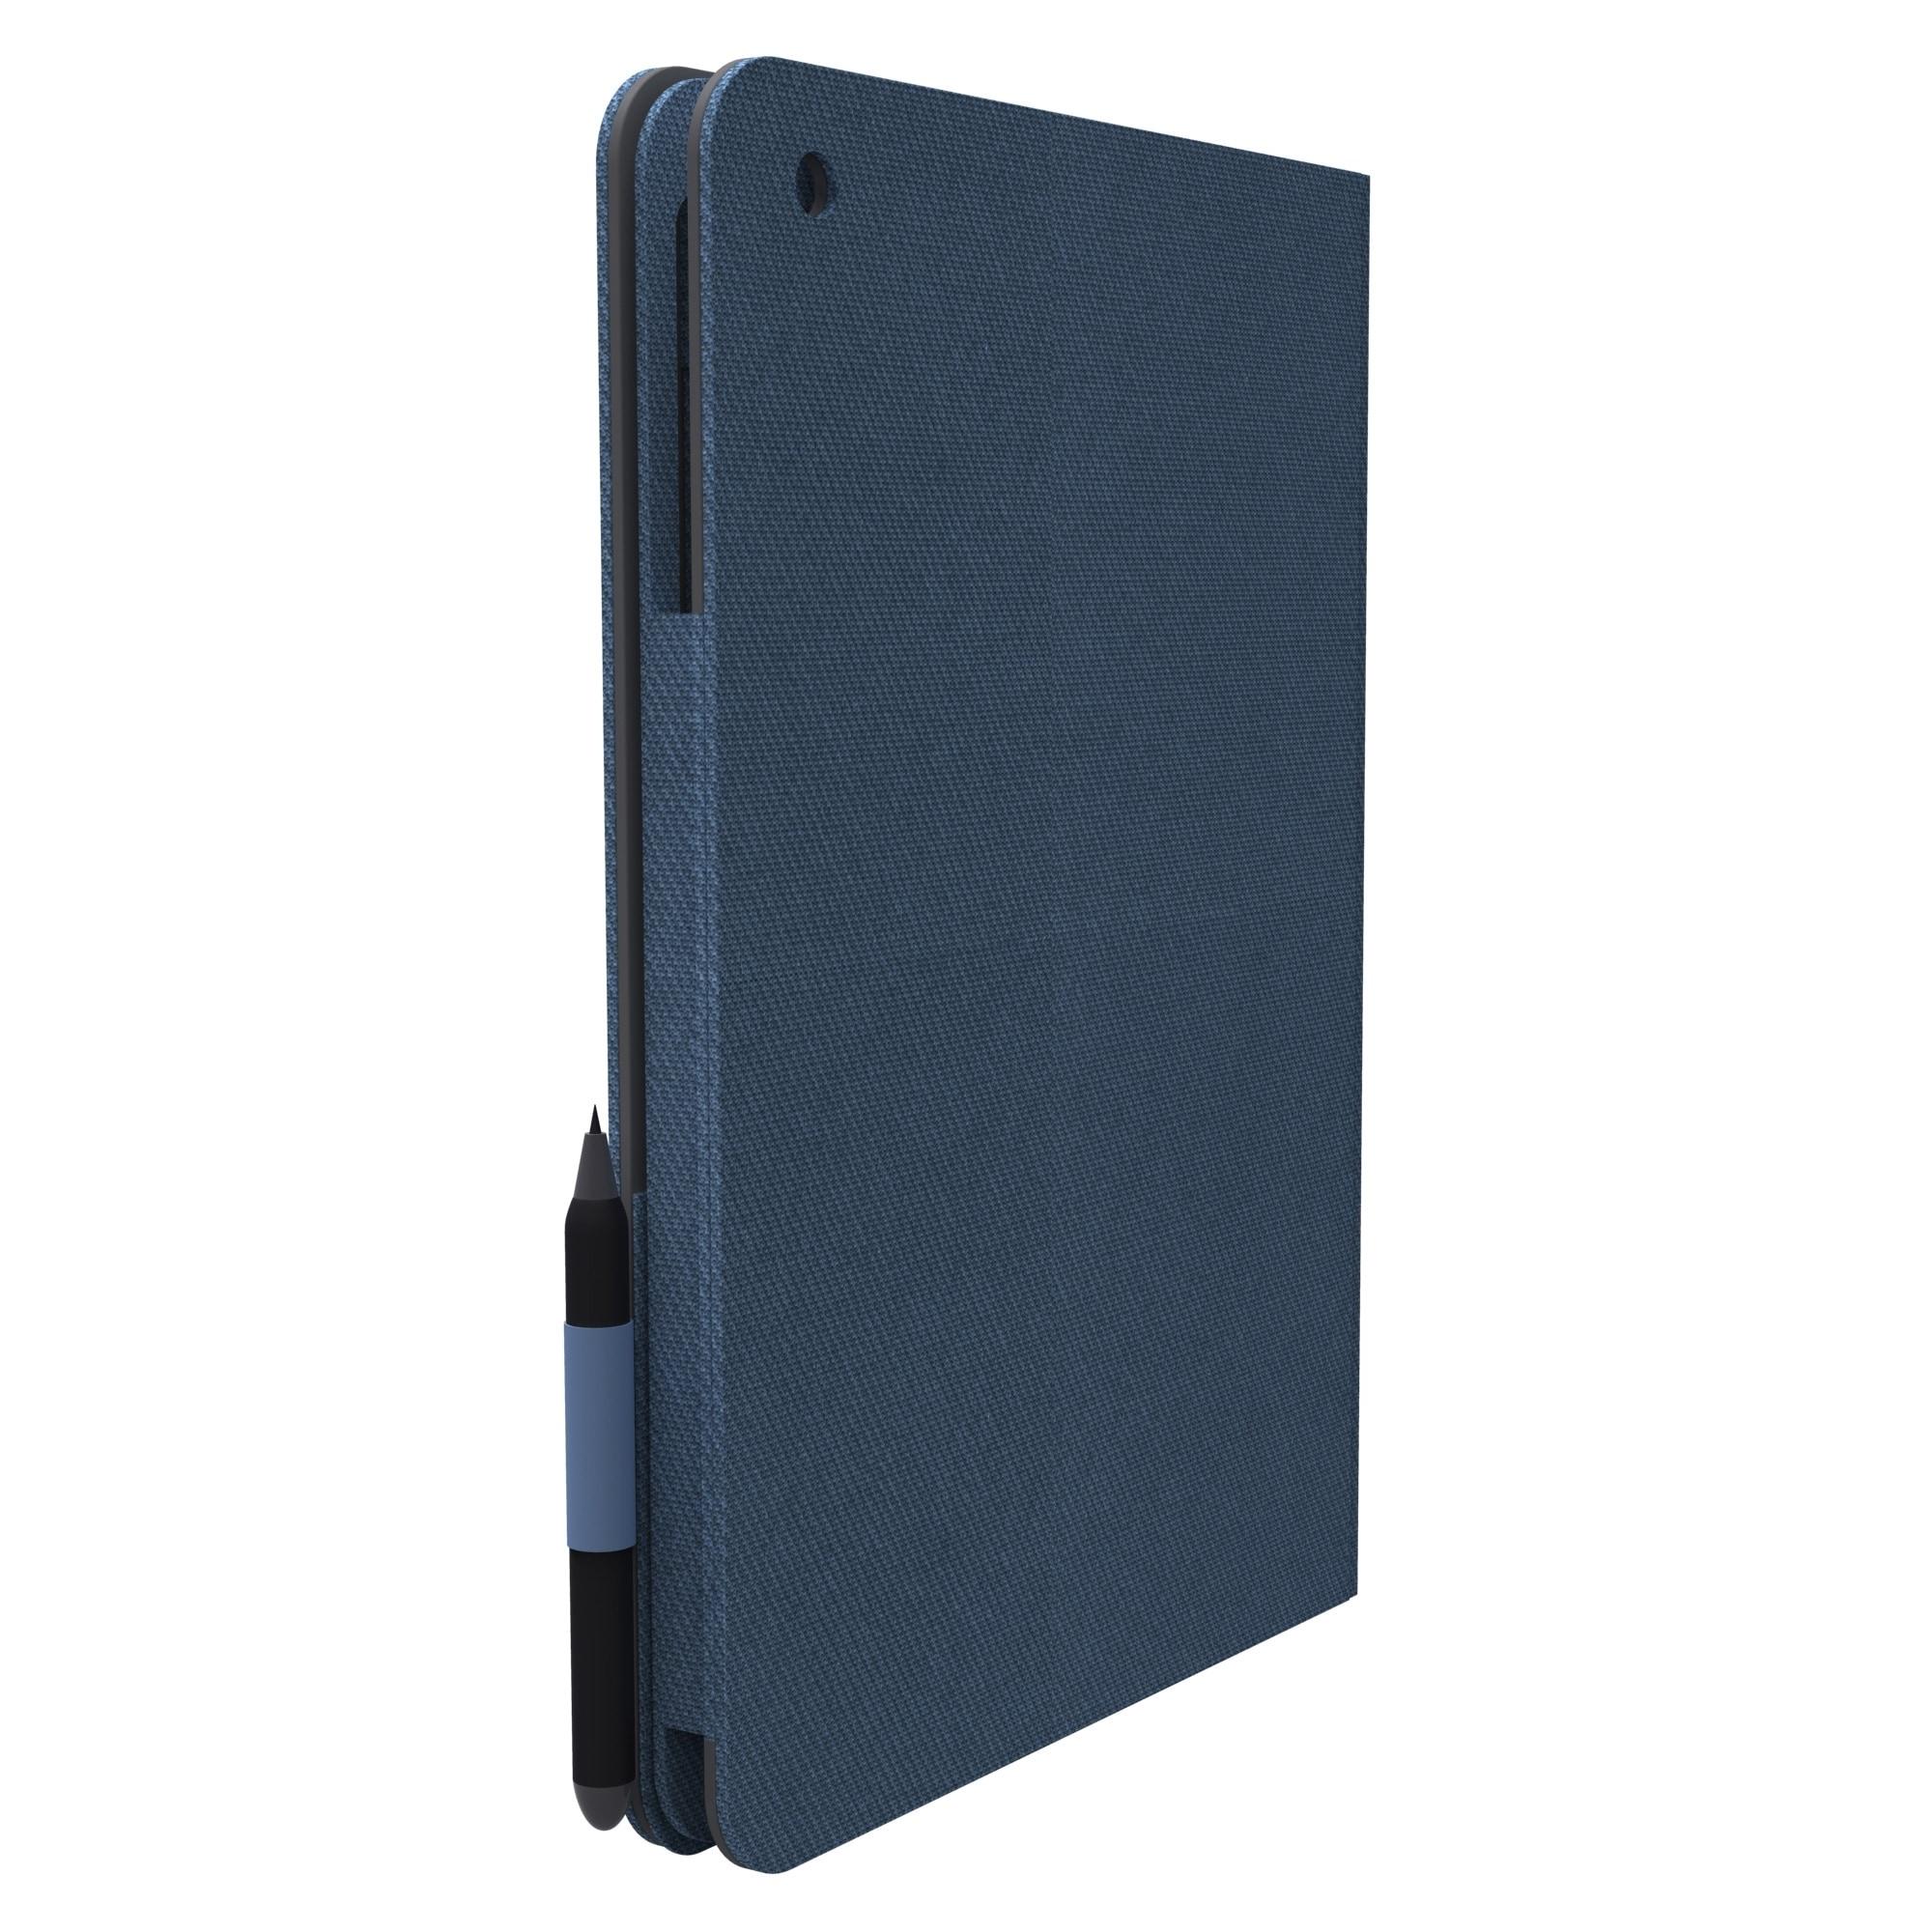 Kensington Comercio K44423WW Carrying Case (Folio) for iPad Air - Sla at Sears.com